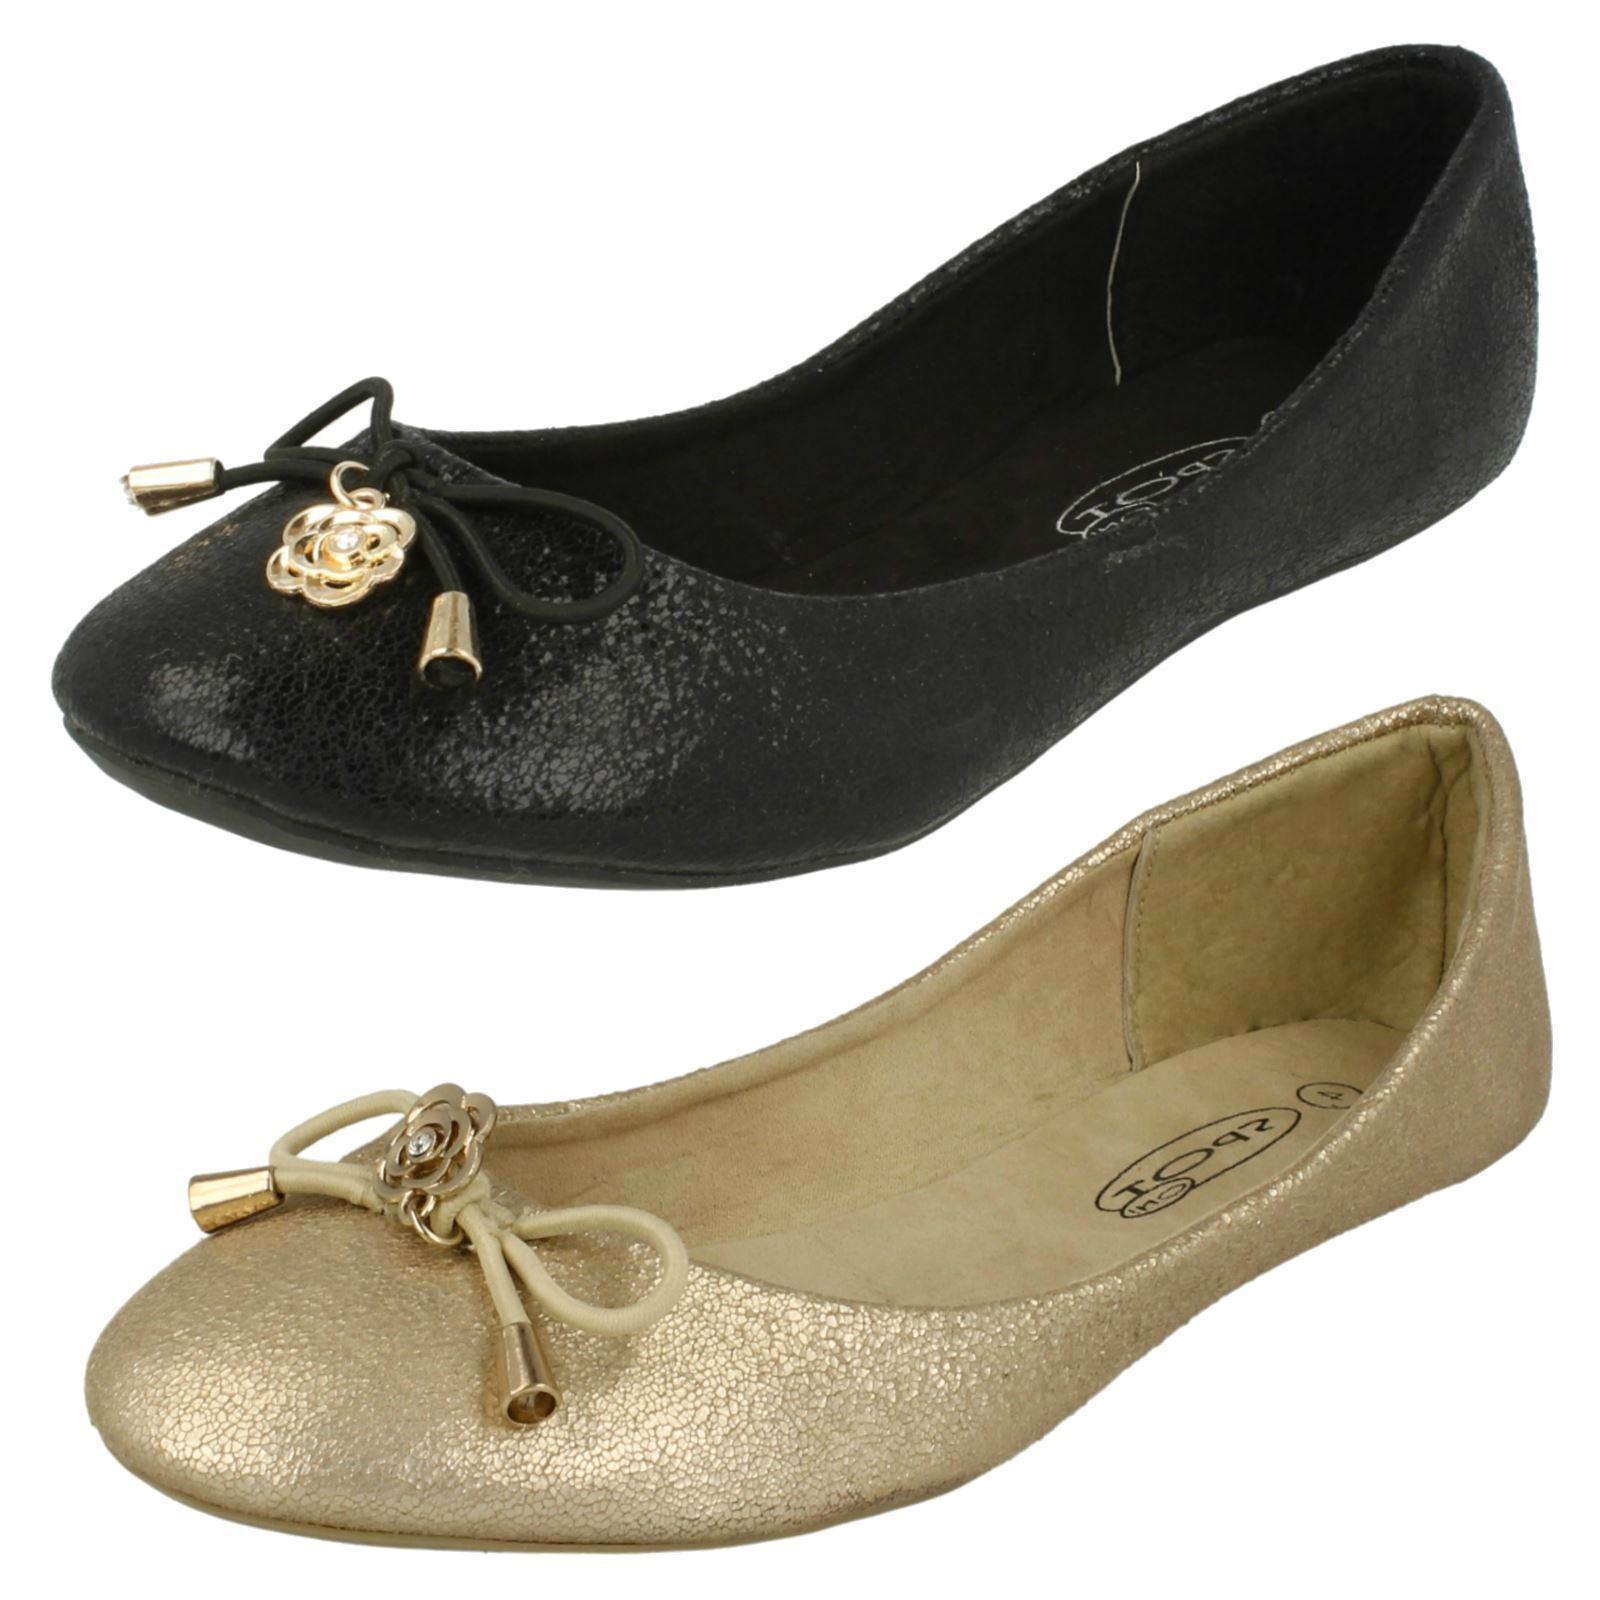 Mujer Spot On Sin Cordones Flor Adorno Lazo Informal Informal Lazo  Zapatos  Planos Bailarina 7268e5